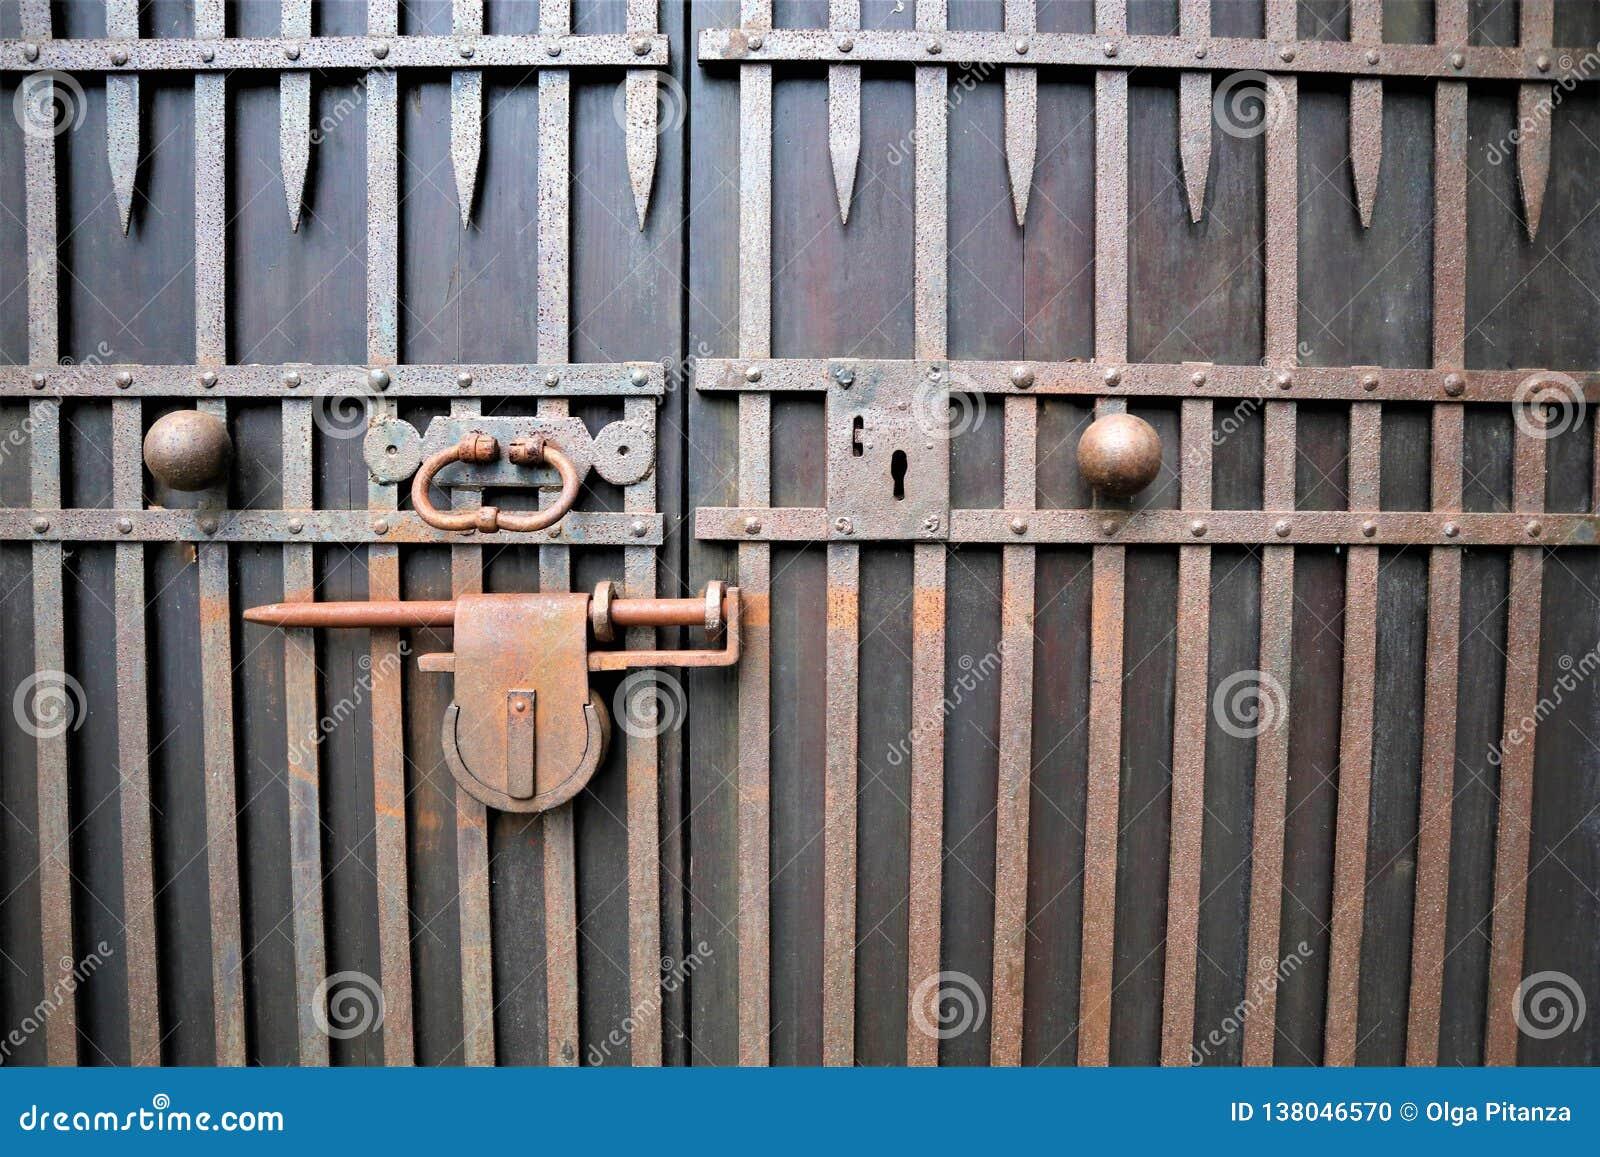 Vieux cadenas rouillé fermé